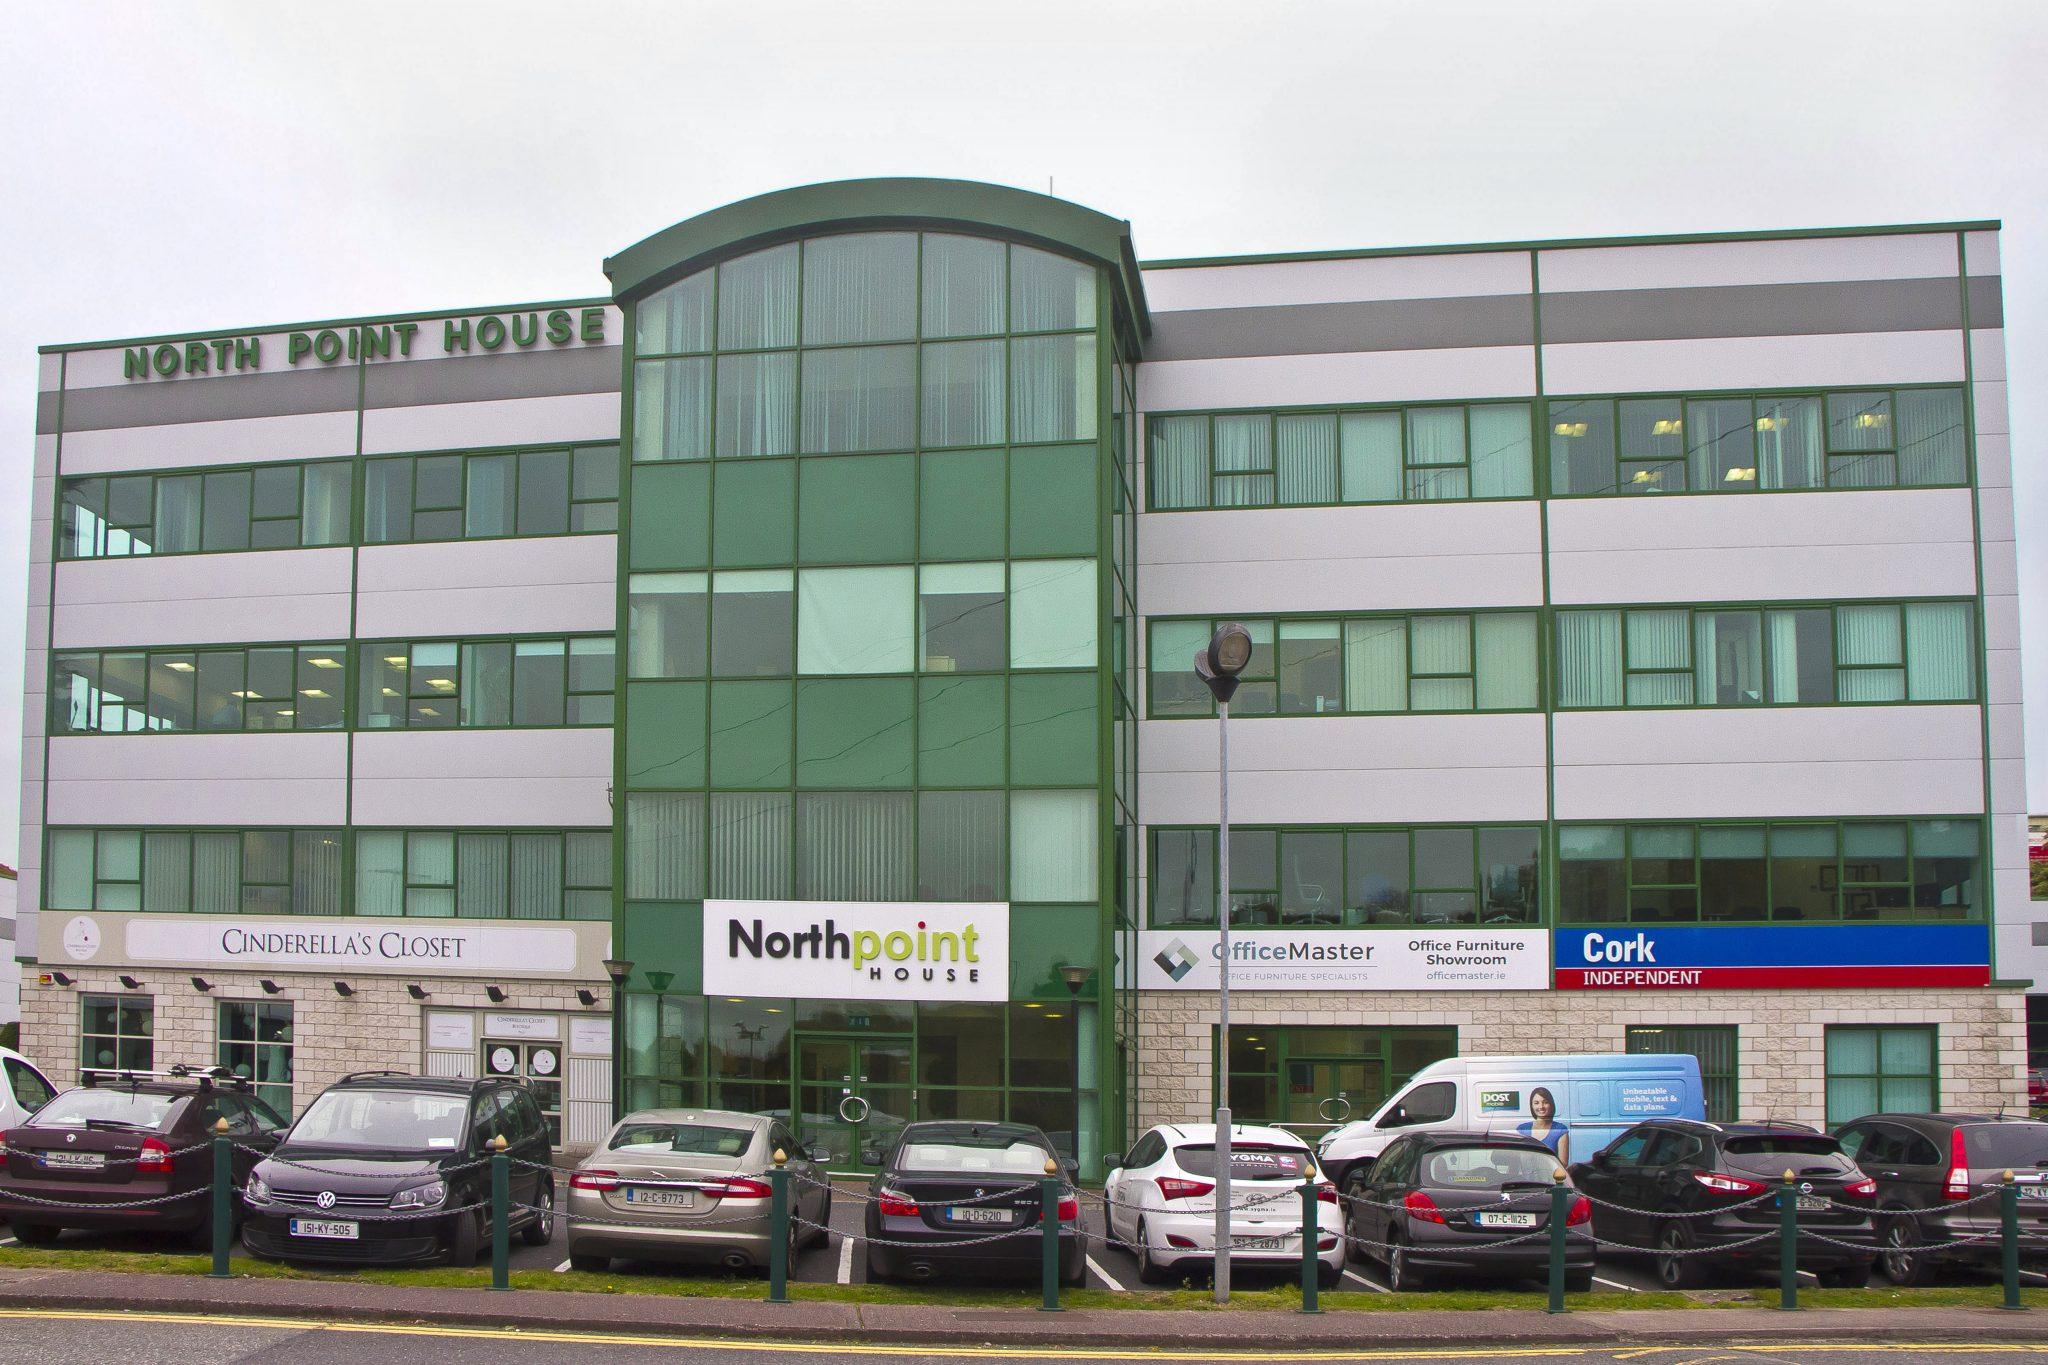 North Point House 01 002 Ryan Hanley